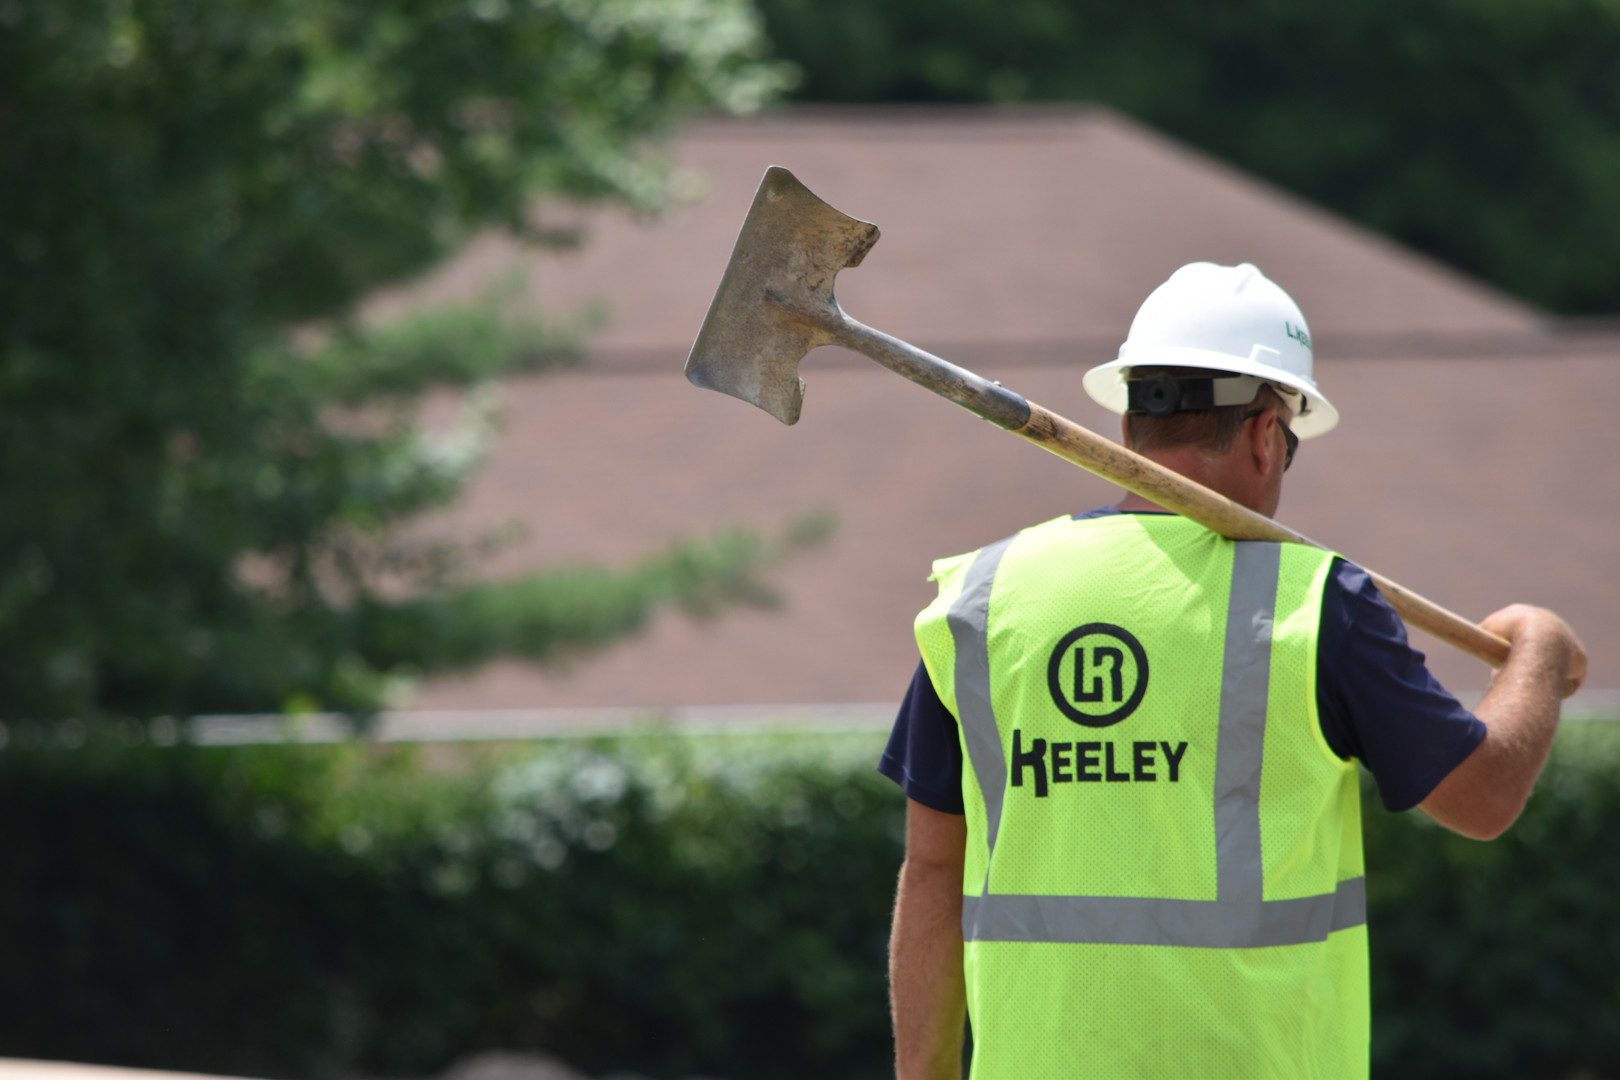 L Keeley Construction Building Paving Ci